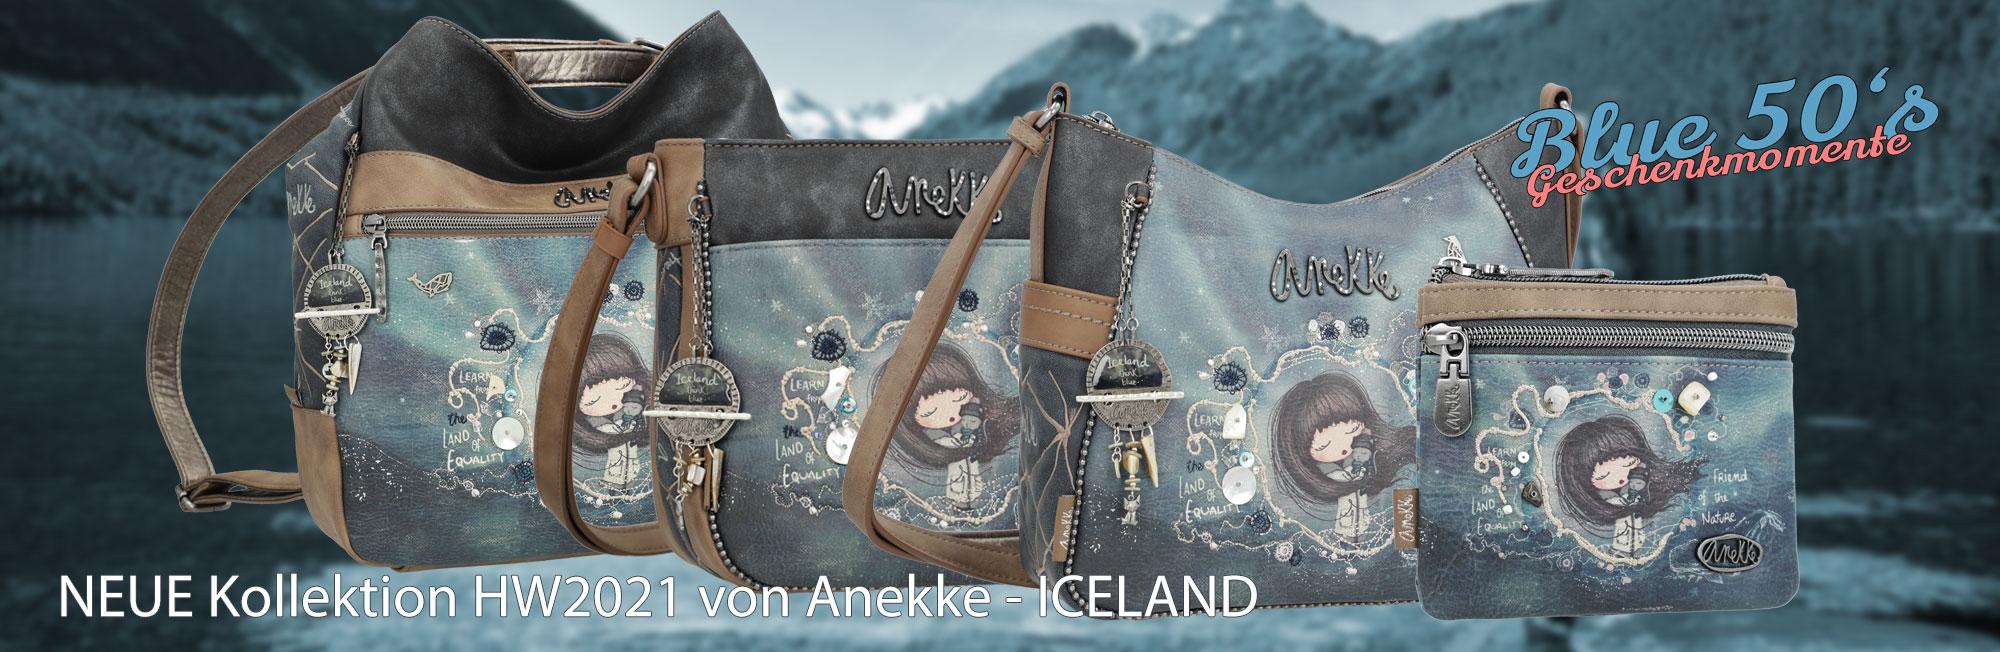 Shopstart Anekke Iceland